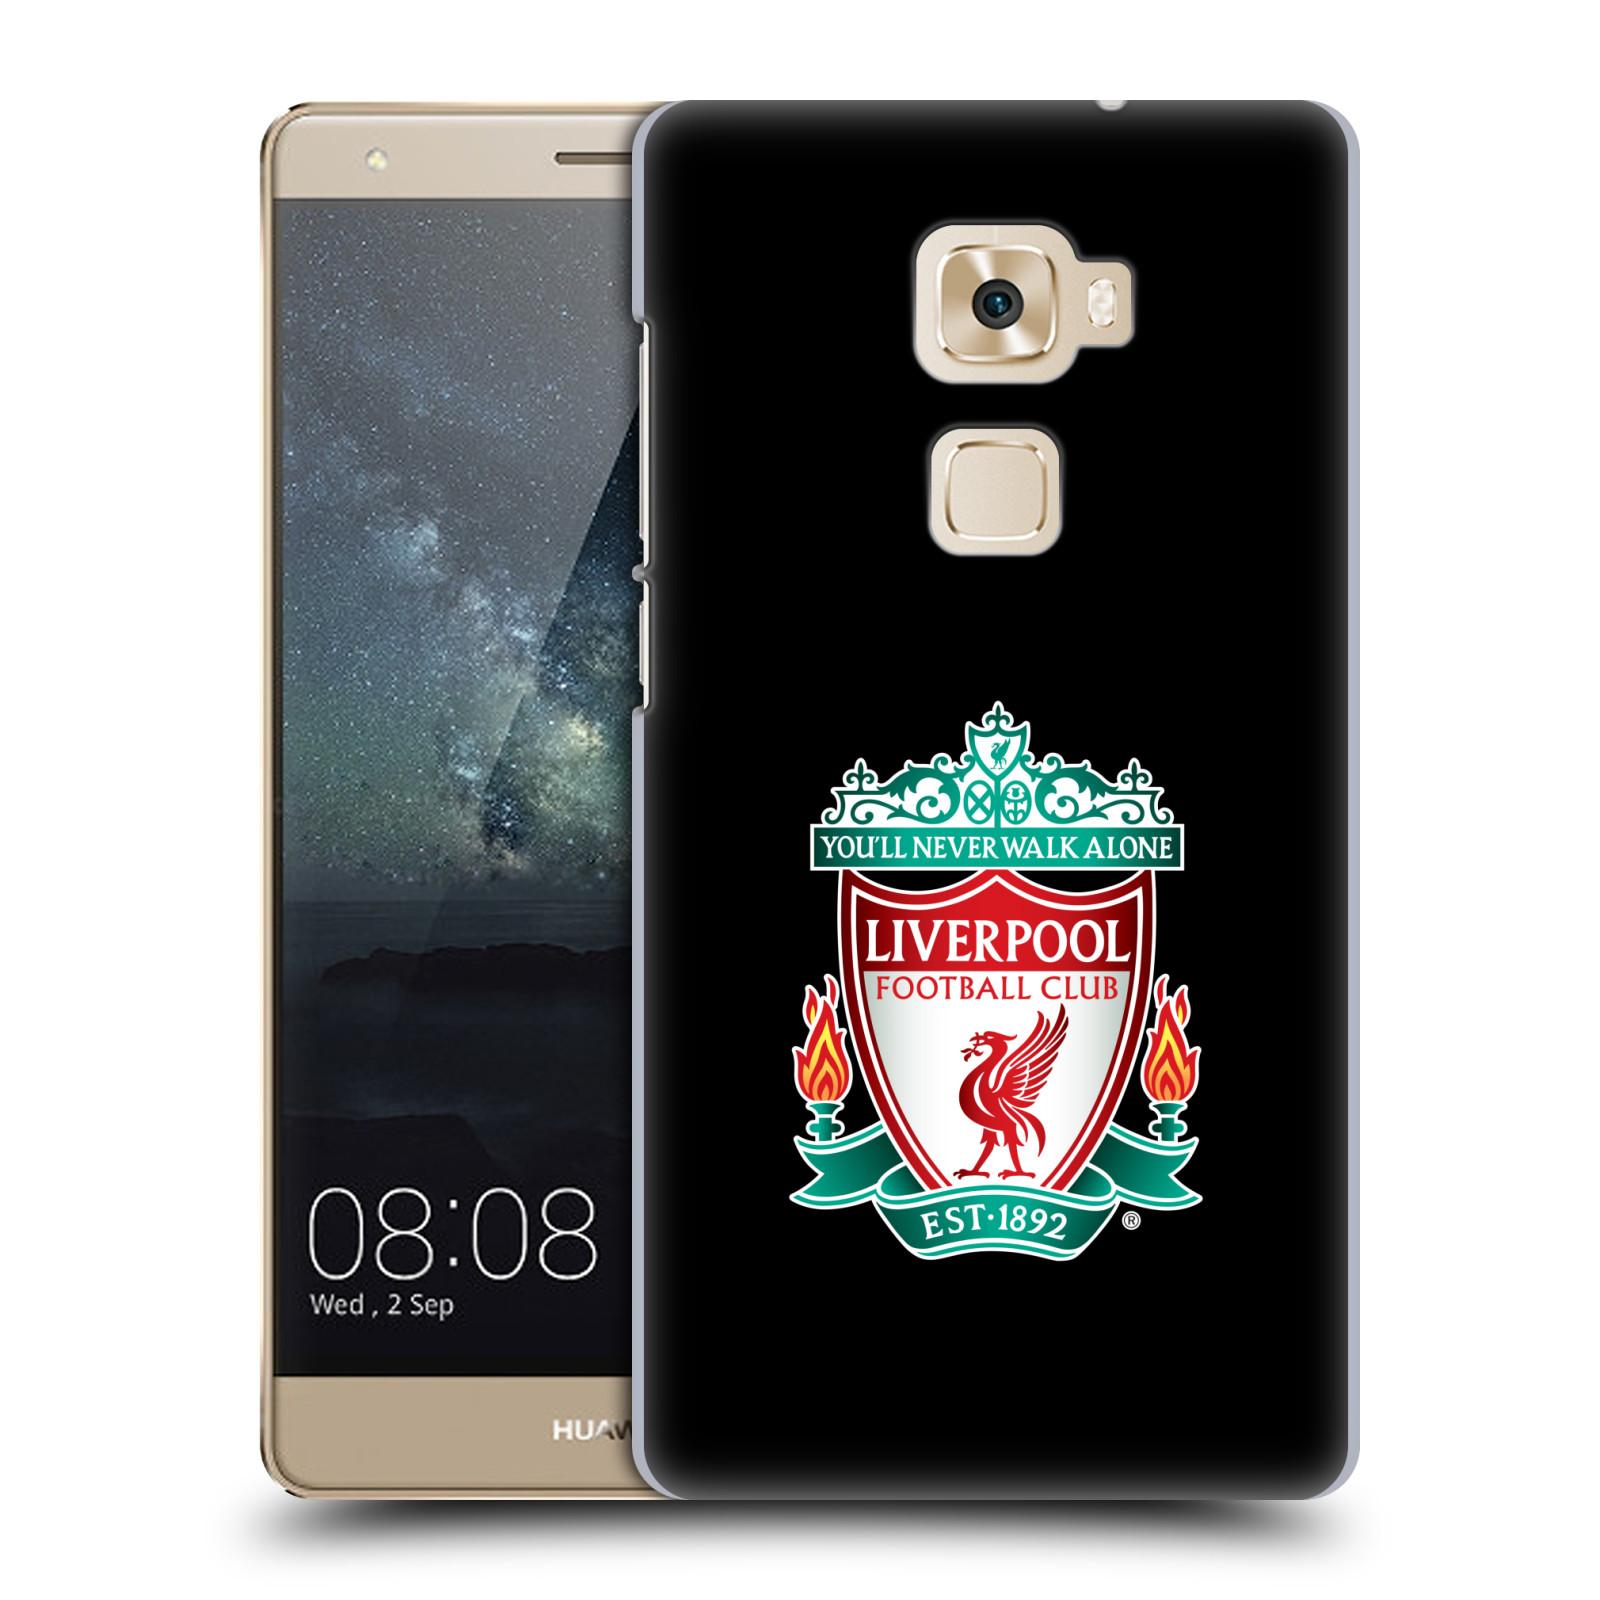 Plastové pouzdro na mobil Huawei Mate S HEAD CASE ZNAK LIVERPOOL FC OFFICIAL BLACK (Plastový kryt či obal na mobilní telefon Liverpool FC Official pro Huawei Mate S)